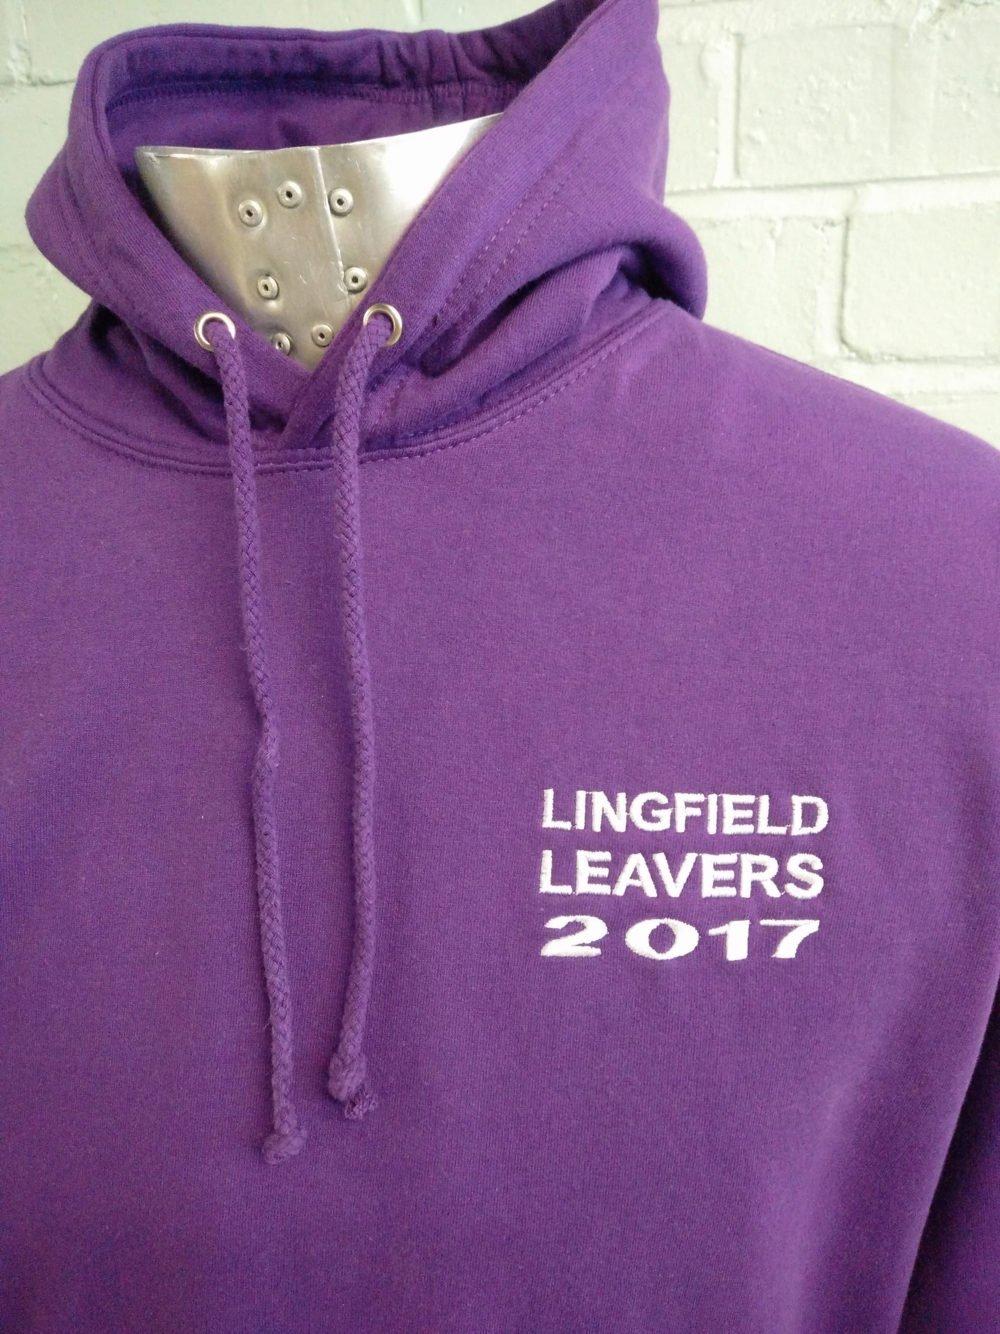 Lingfield Leavers Update 2017